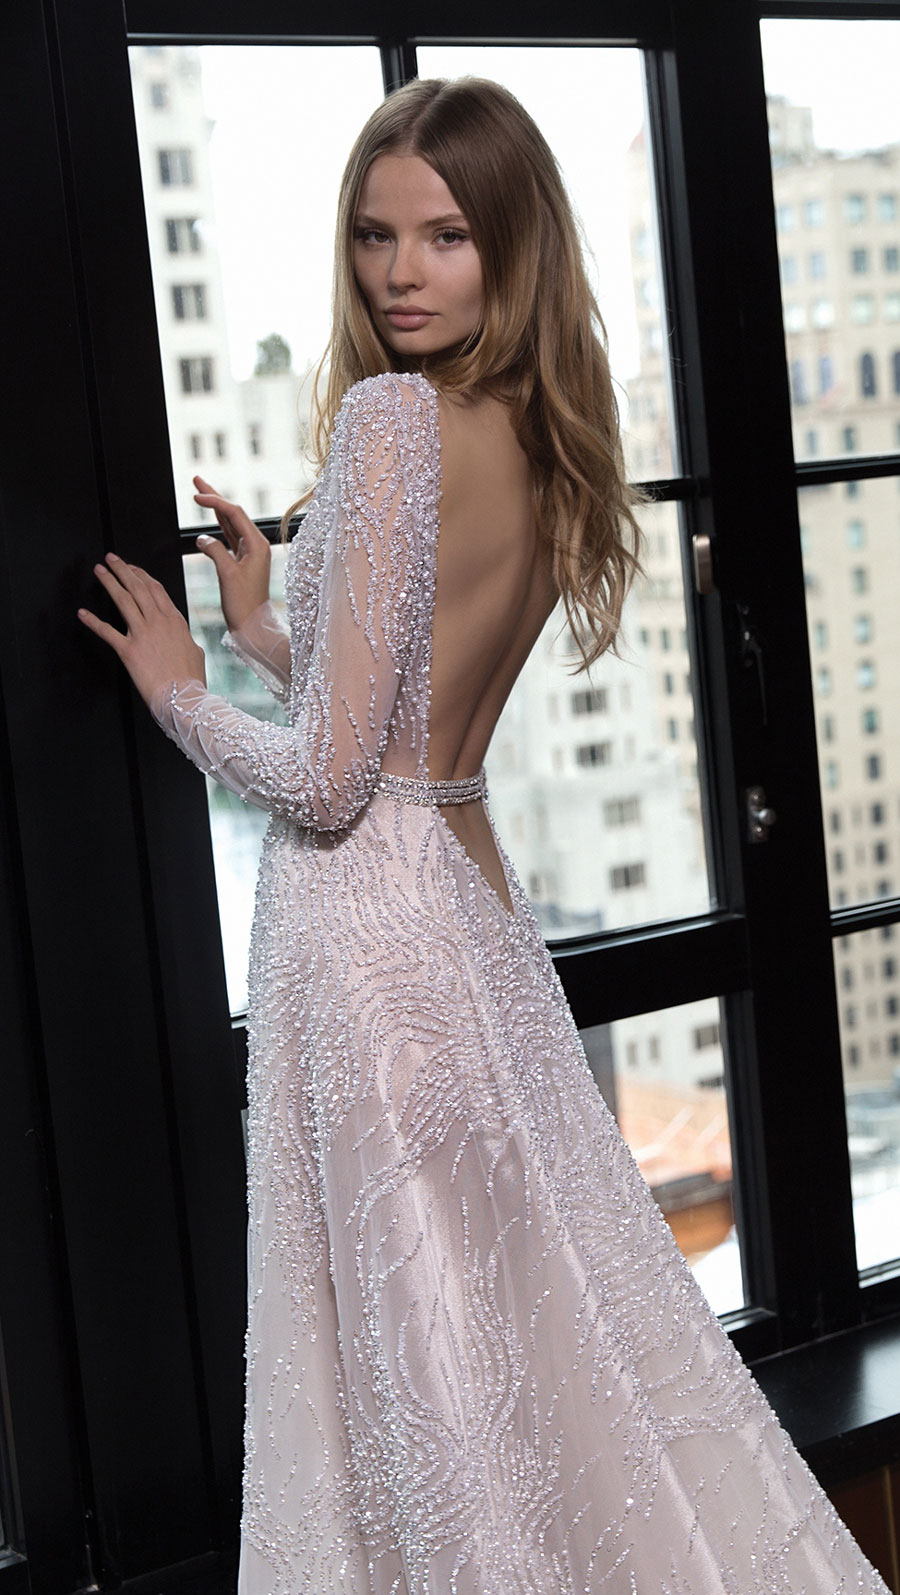 Berta-Bridal-Wedding-Dresses-Fall-Winter-2016-Bridal-Collection-00042